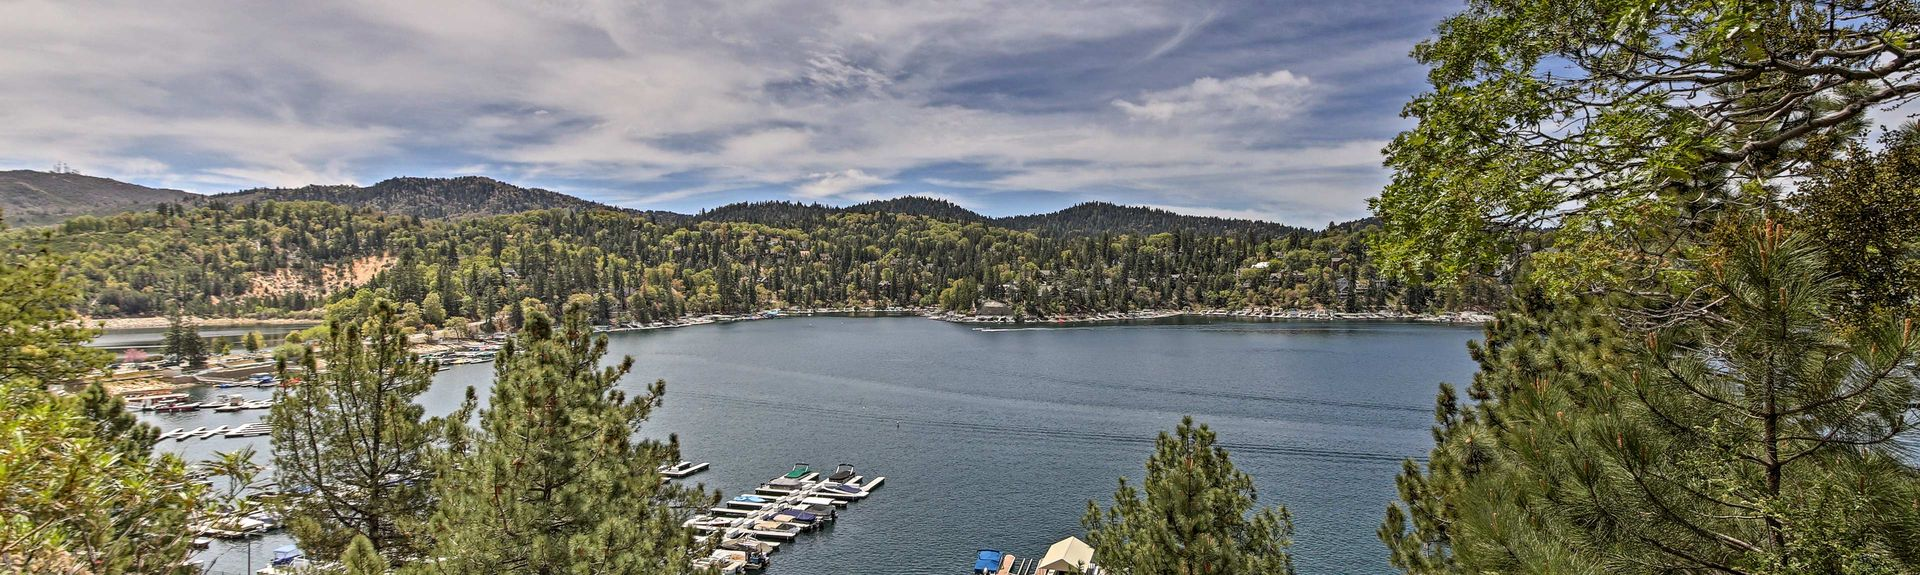 Lake Gregory Regional Park, Crestline, California, United States